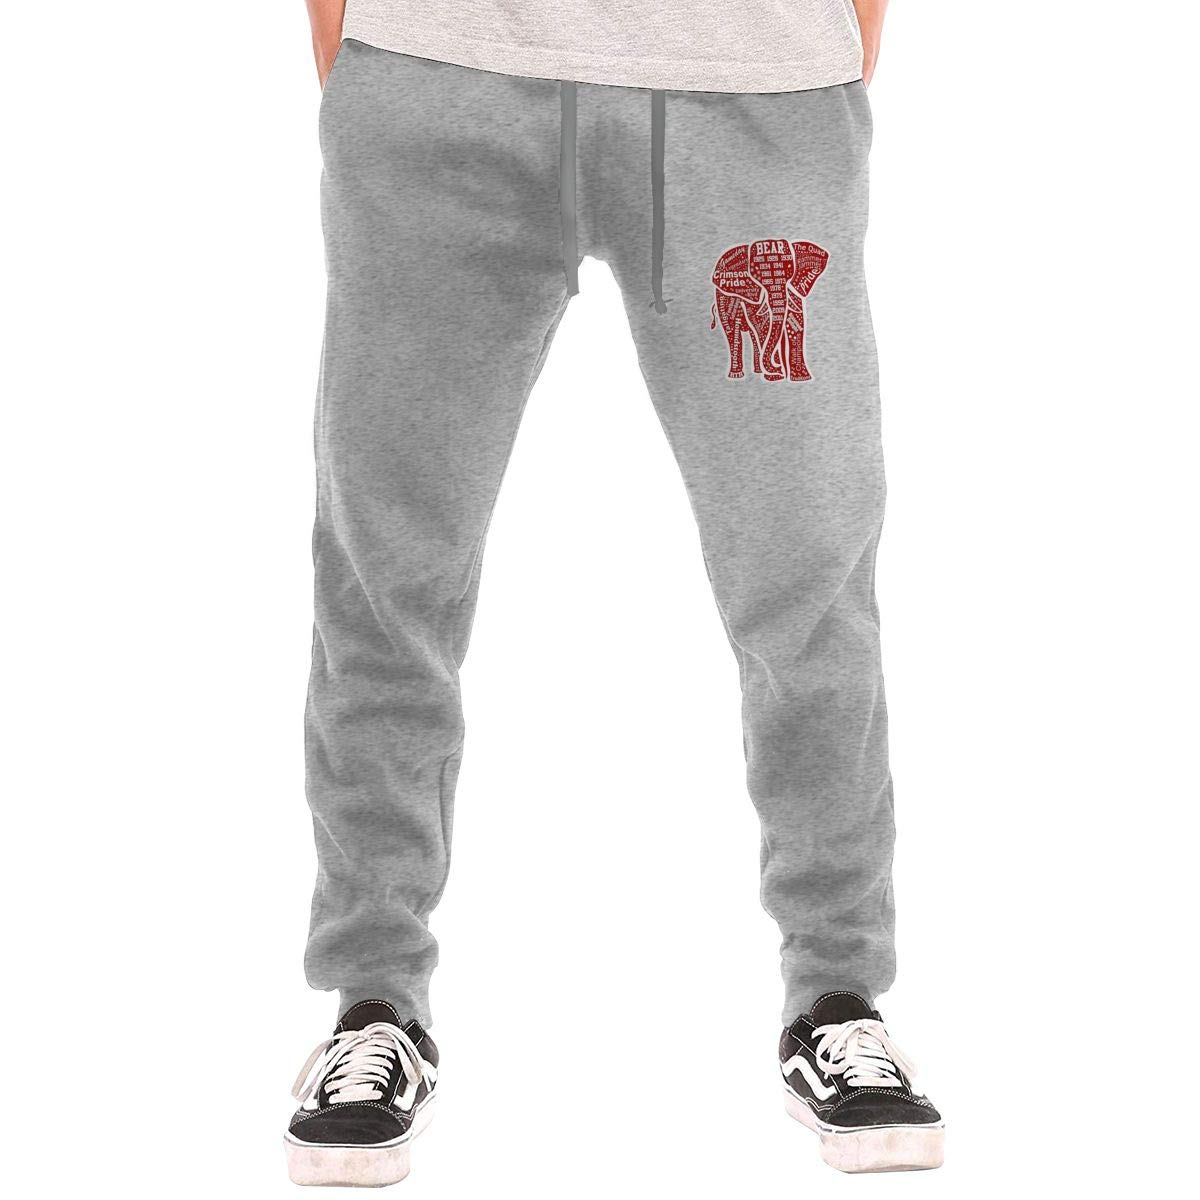 Alabama Red Elephant Drawstring Waist,100/% Cotton,Elastic Waist Cuffed,Jogger Sweatpants Black